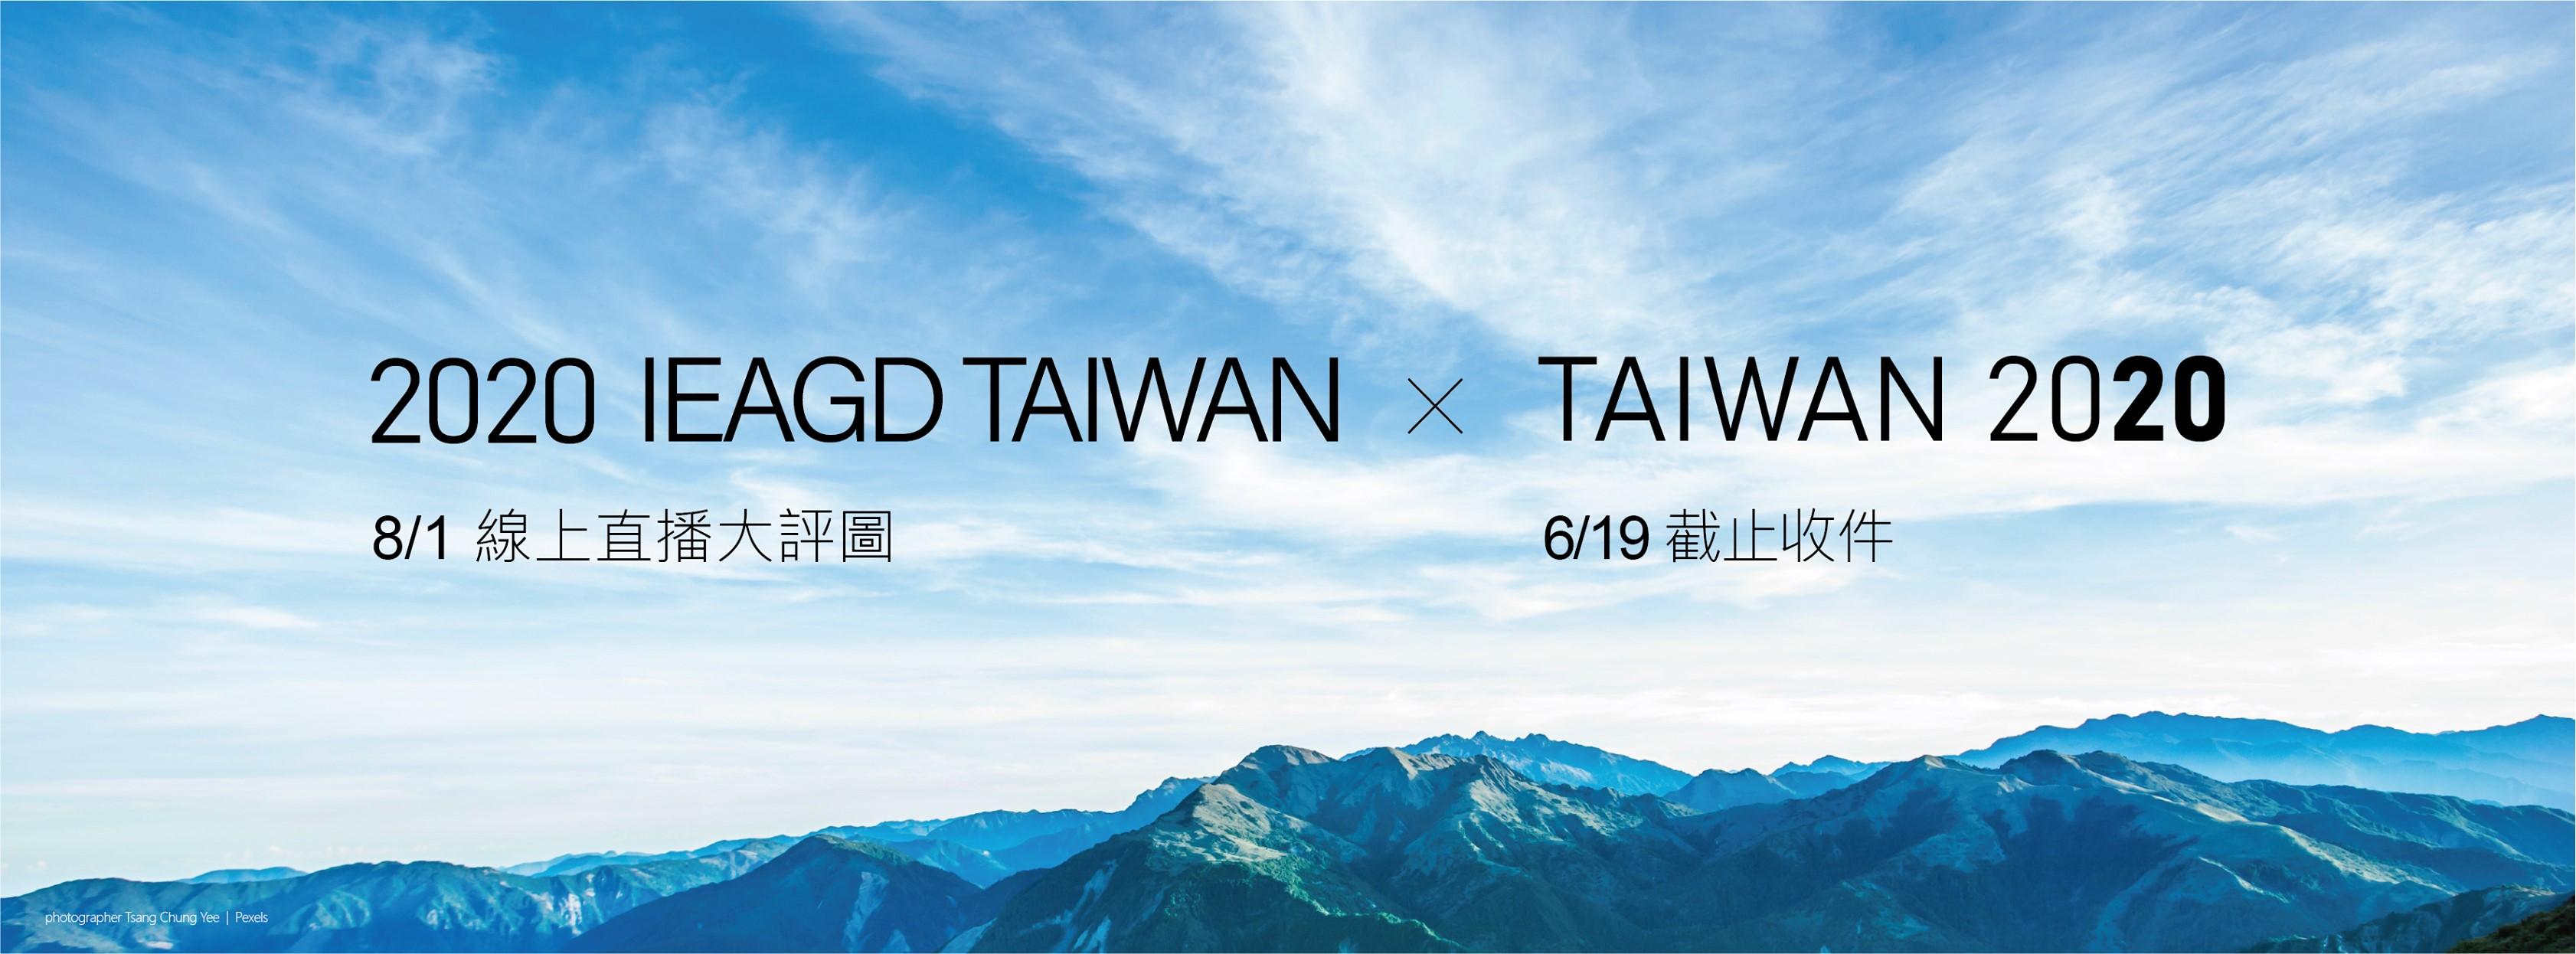 2020 Taiwan20 開始收件囉!